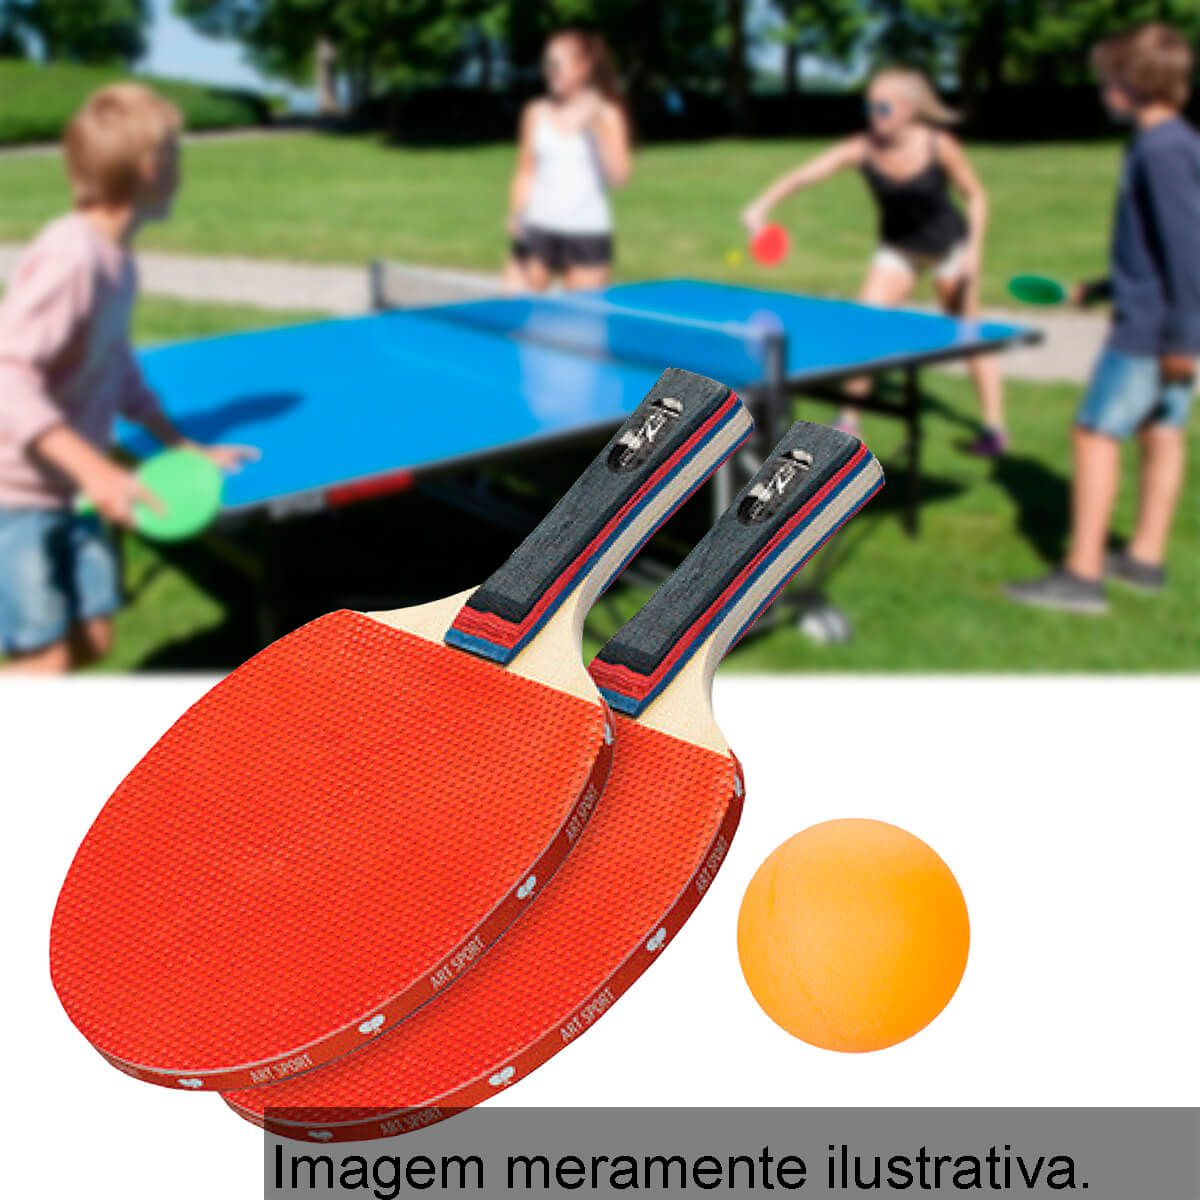 dafbb2bab Aê Comprou! Kit Ping Pong Tênis De Mesa 2 Raquetes